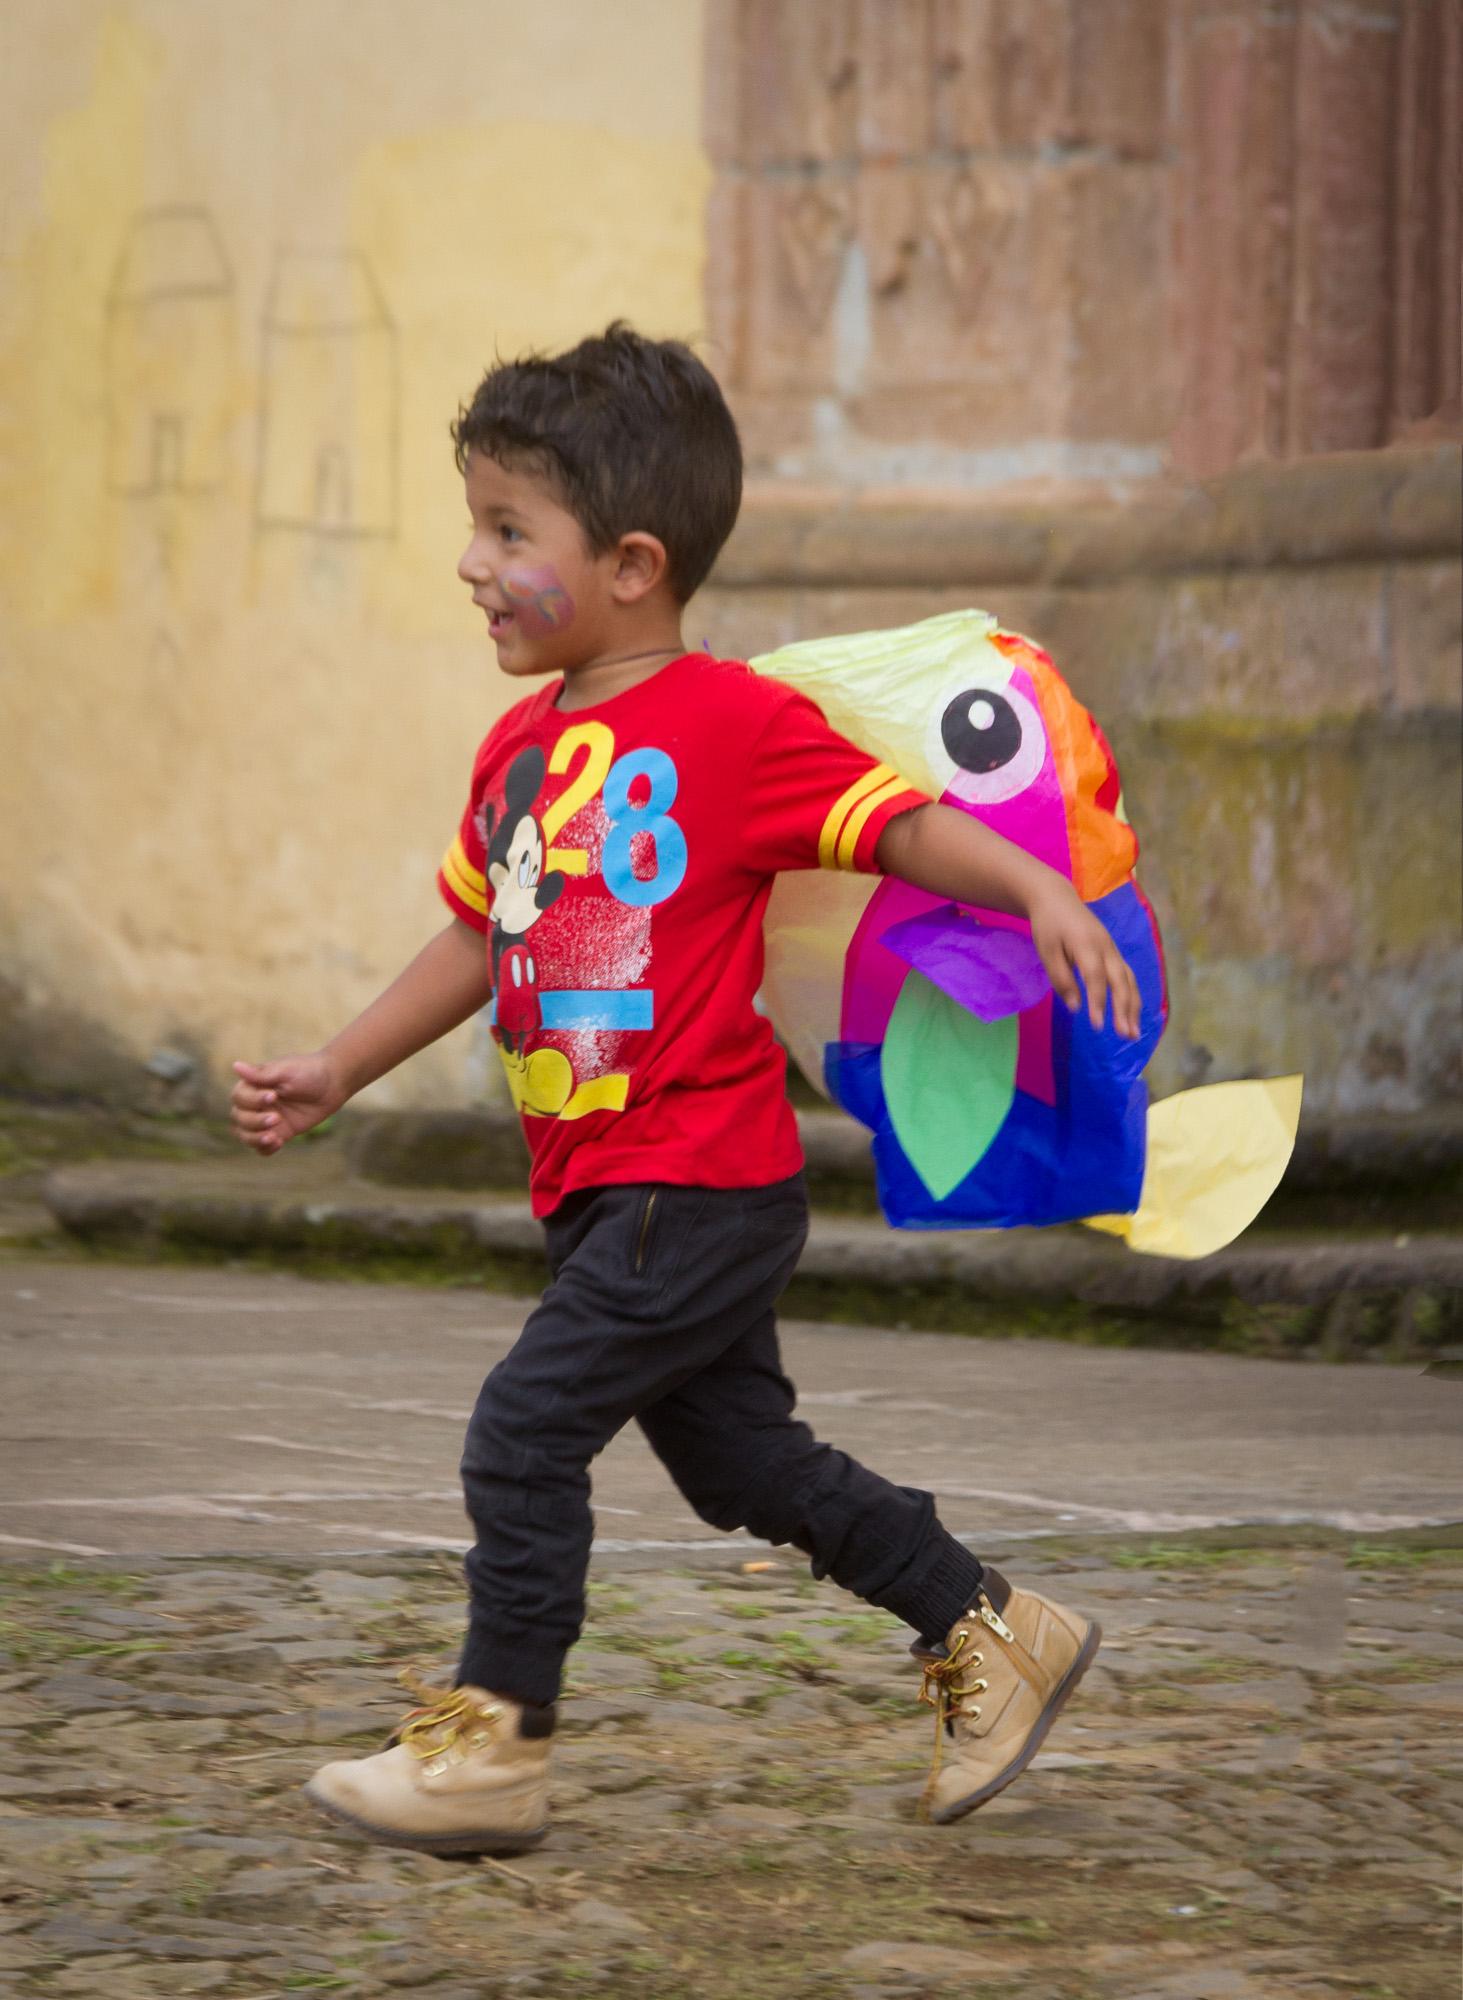 Gone Fishin'   CantoyaFest: Pátzcuaro, Michoacán, Mexico — Saturday, July 22, 2017